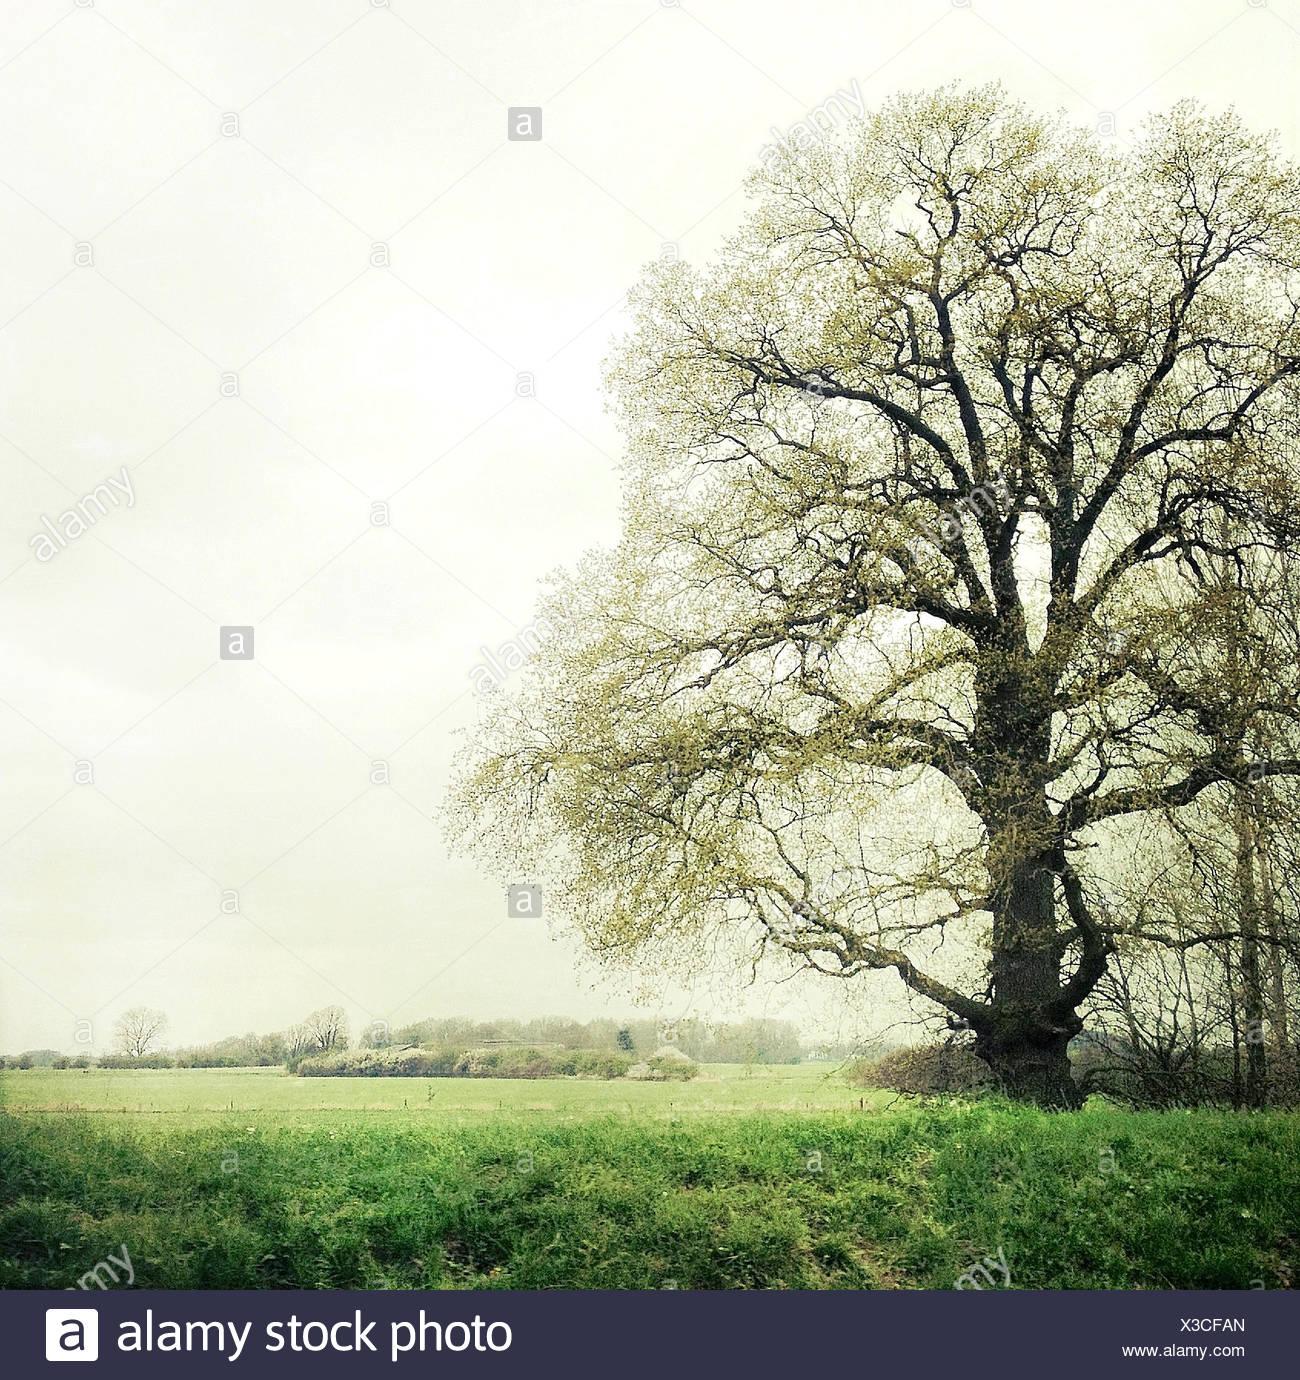 Large tree on field - Stock Image